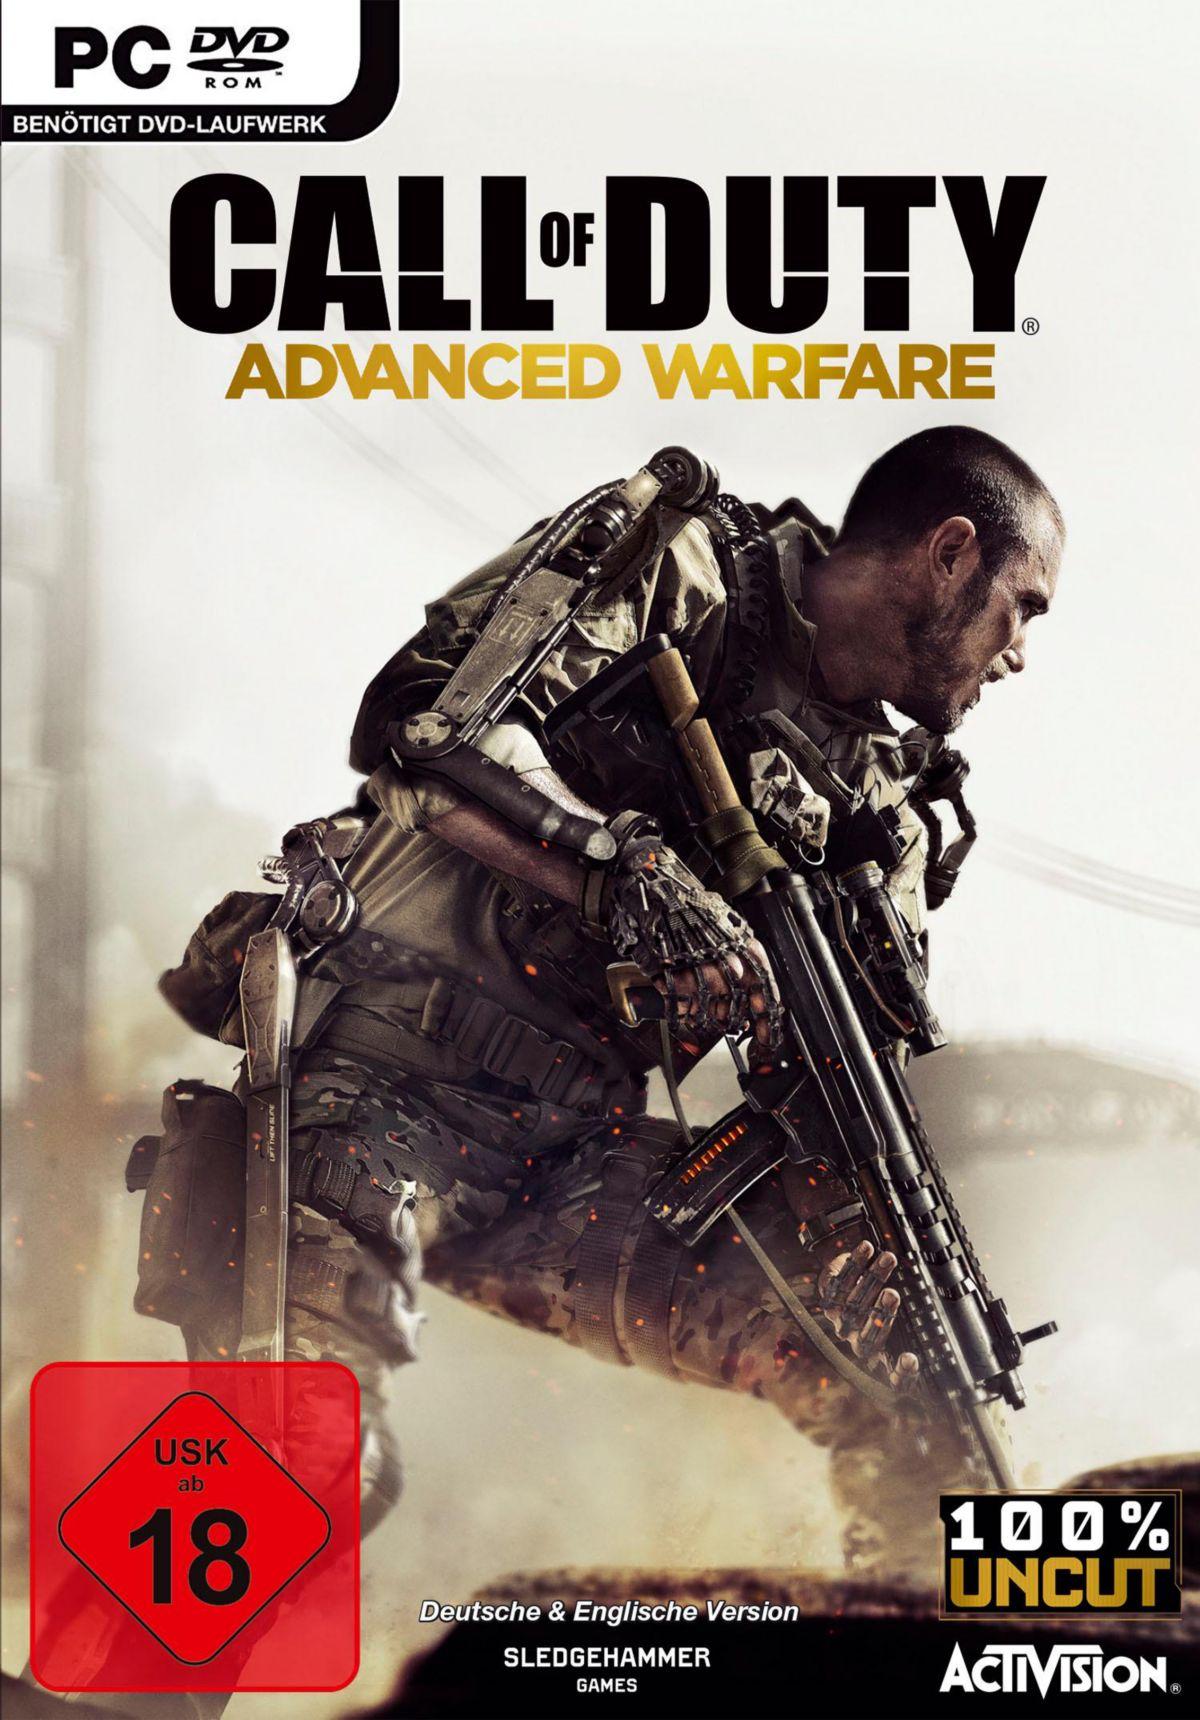 Call of Duty: Advanced Warfare PC (Blu-ray Disc)